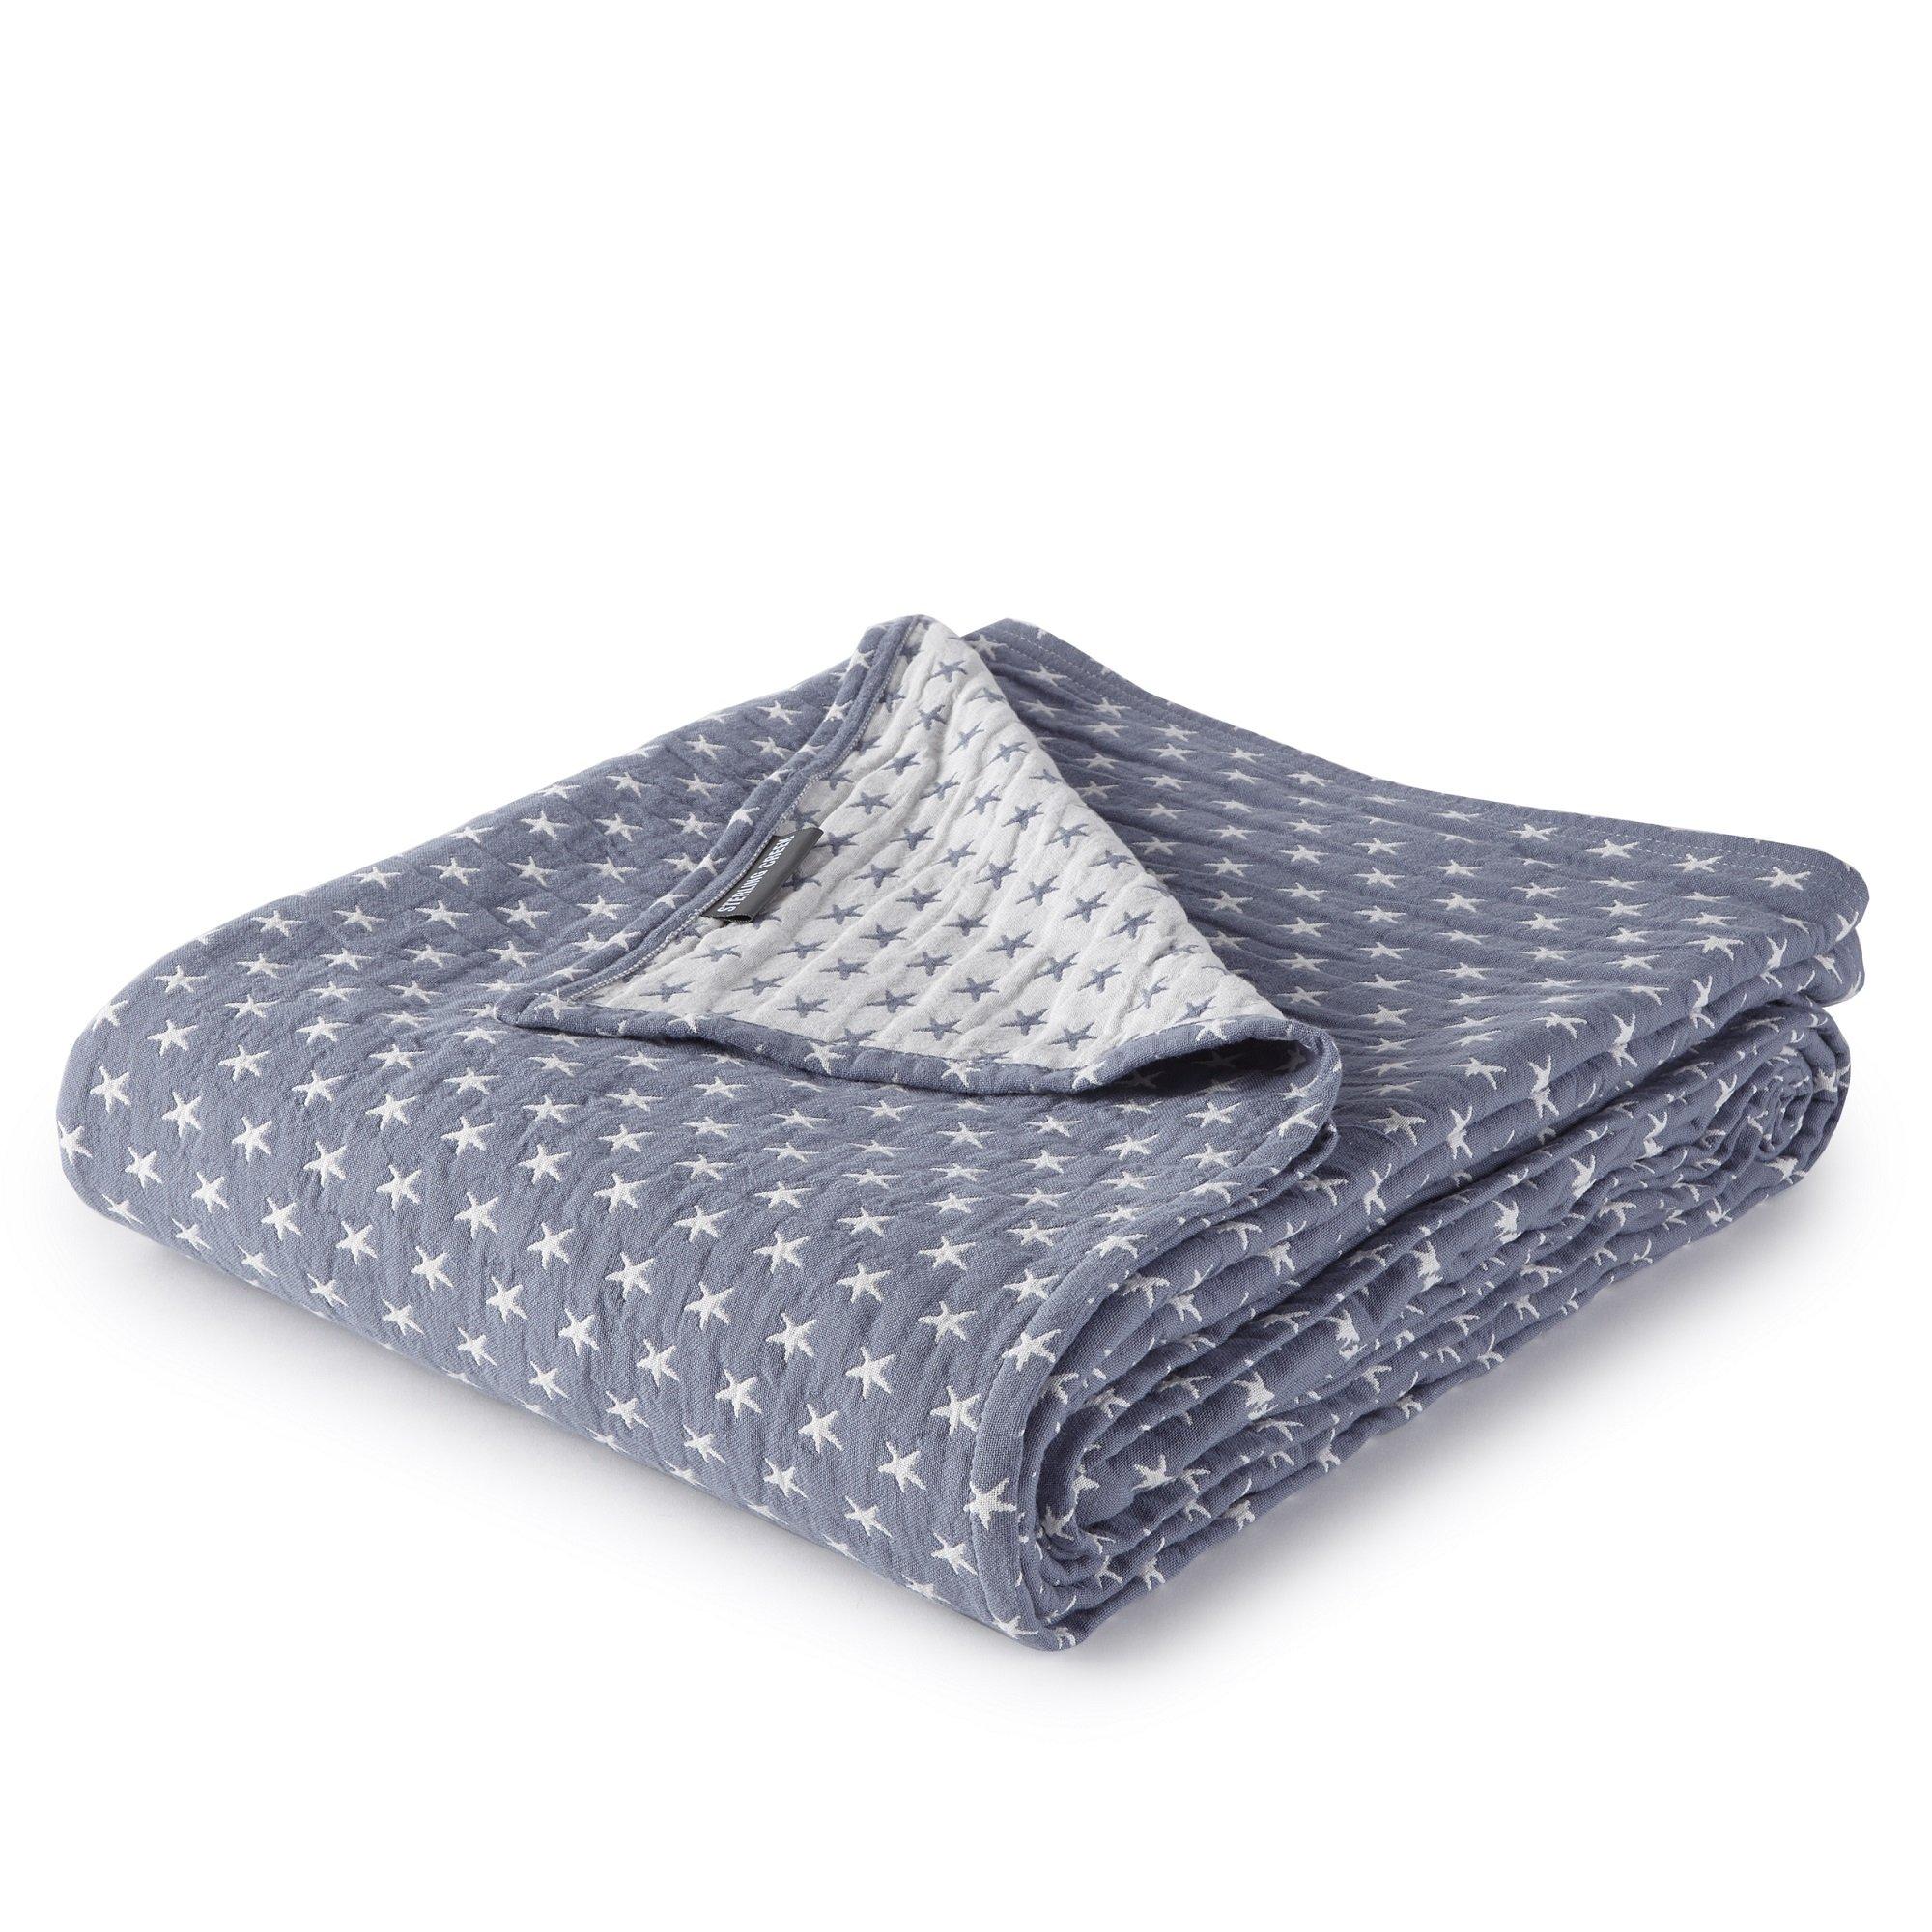 Dawson Star Three Layers Lightweight 100% Soft Washed Cotton Gauzy Blanket (King, Blue)